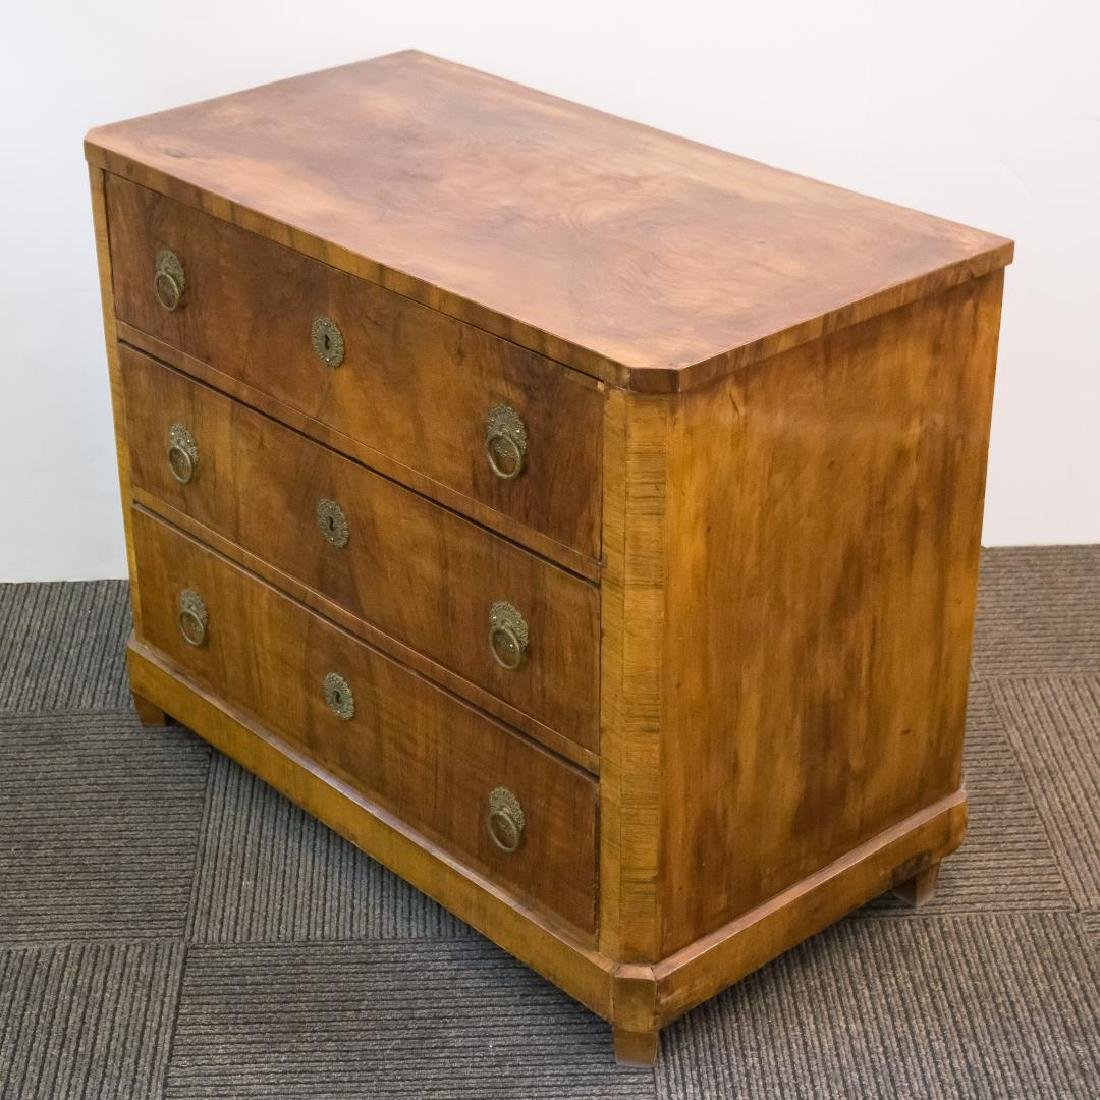 Biedermeier Burlwood Chest of Drawers, Period - 5